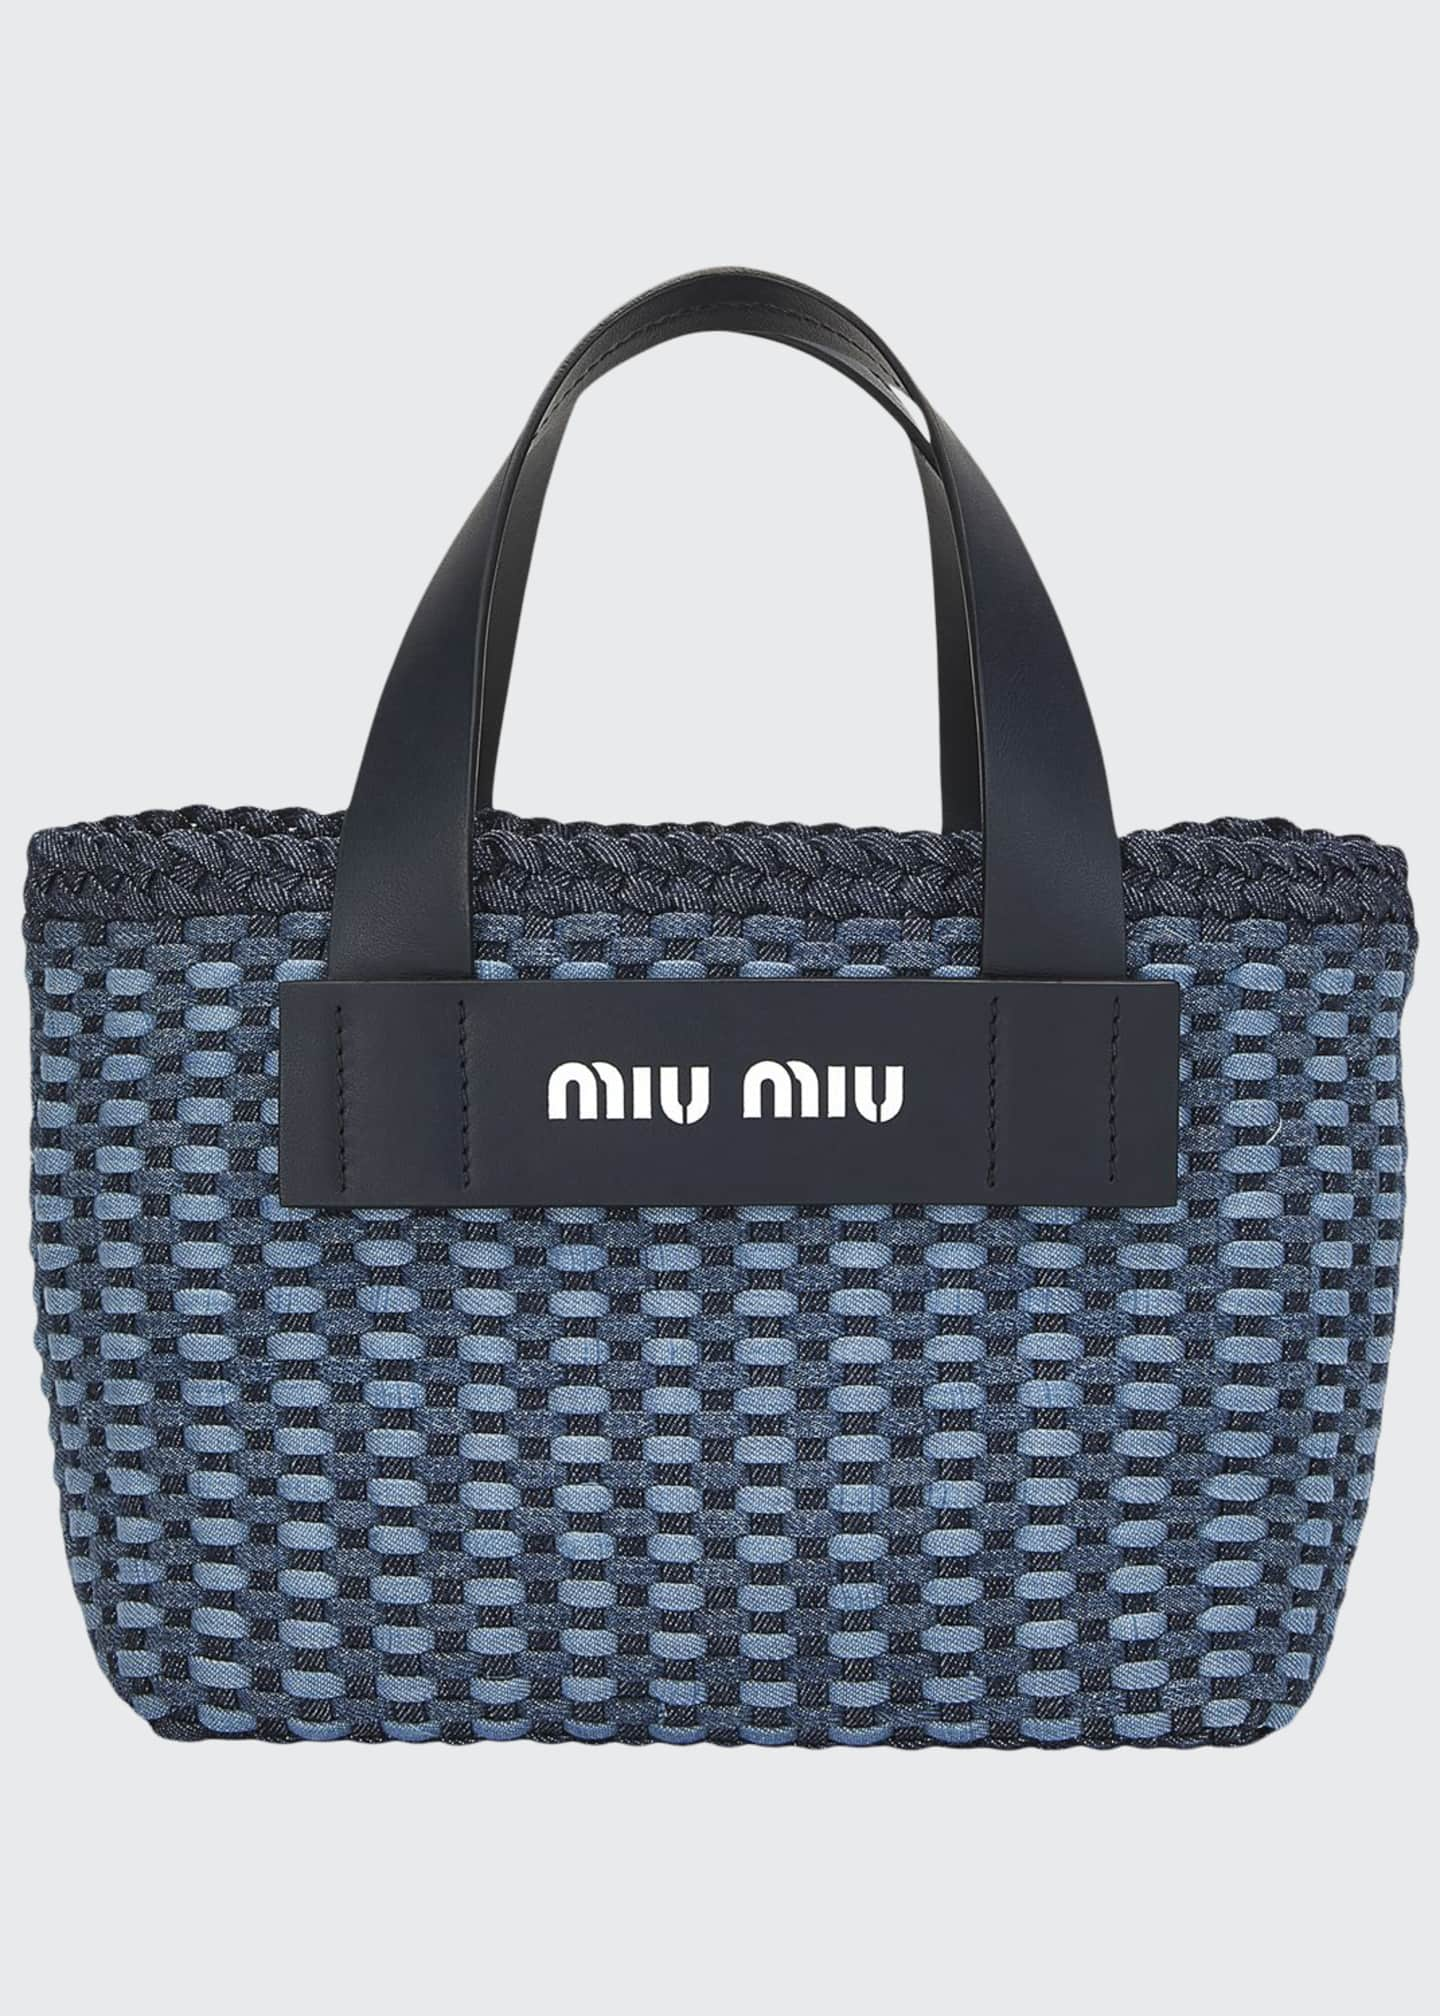 Miu Miu Inctreccio Denim Tote Bag